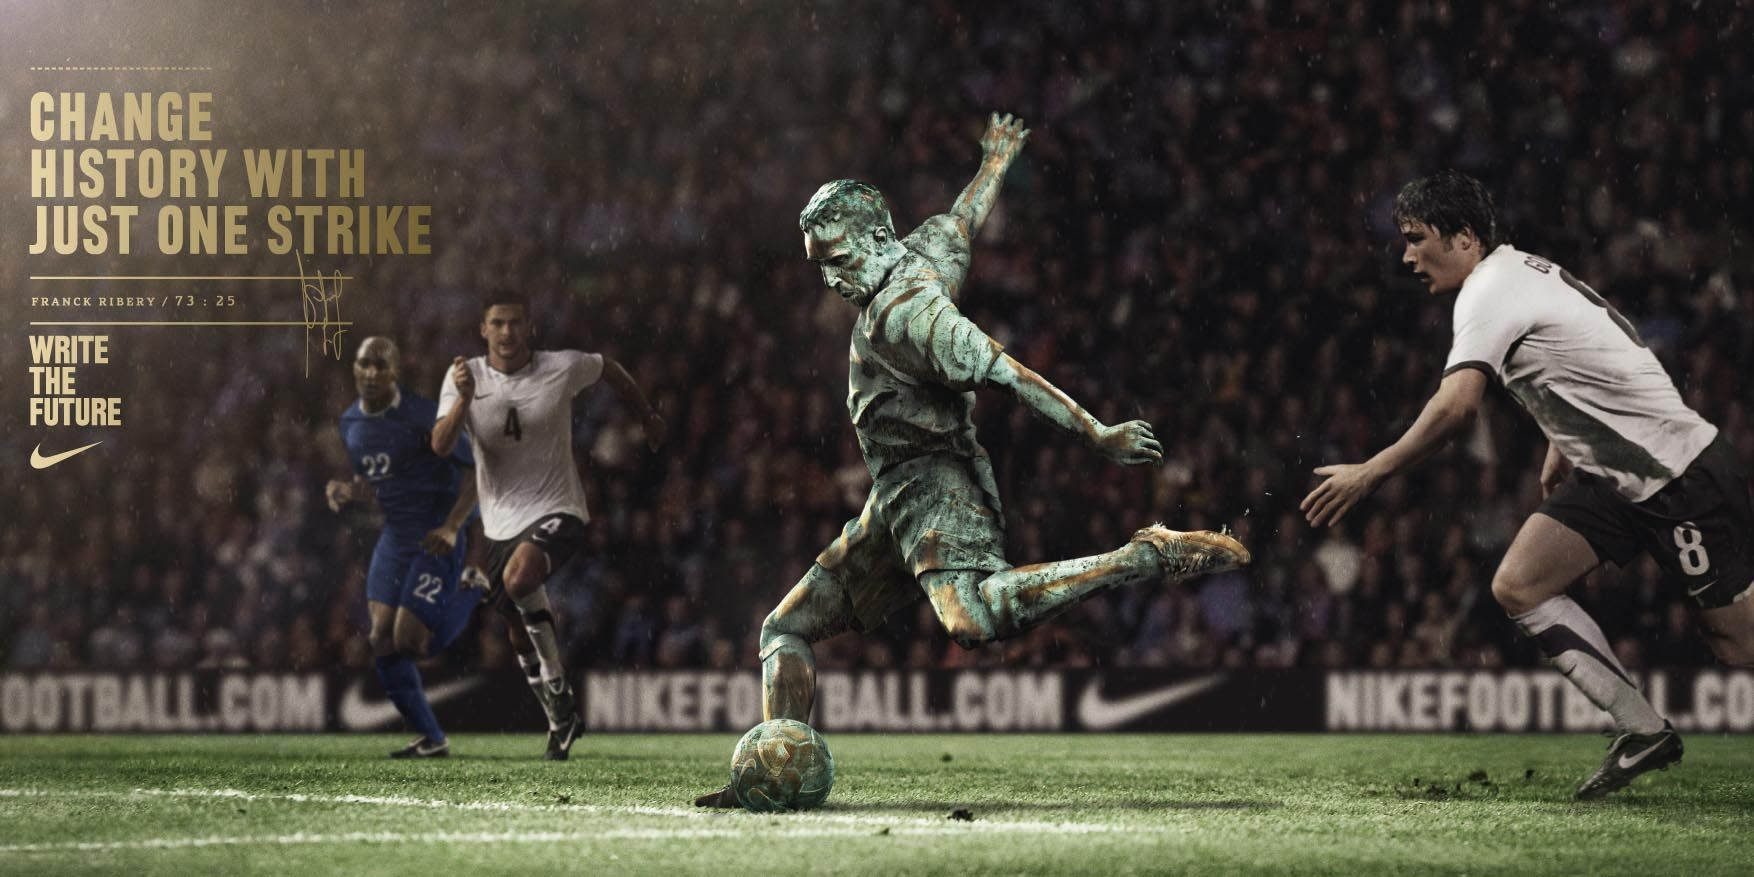 Sudamerica escalar amenaza  I love this this idea | Nike soccer, Nike football, Soccer